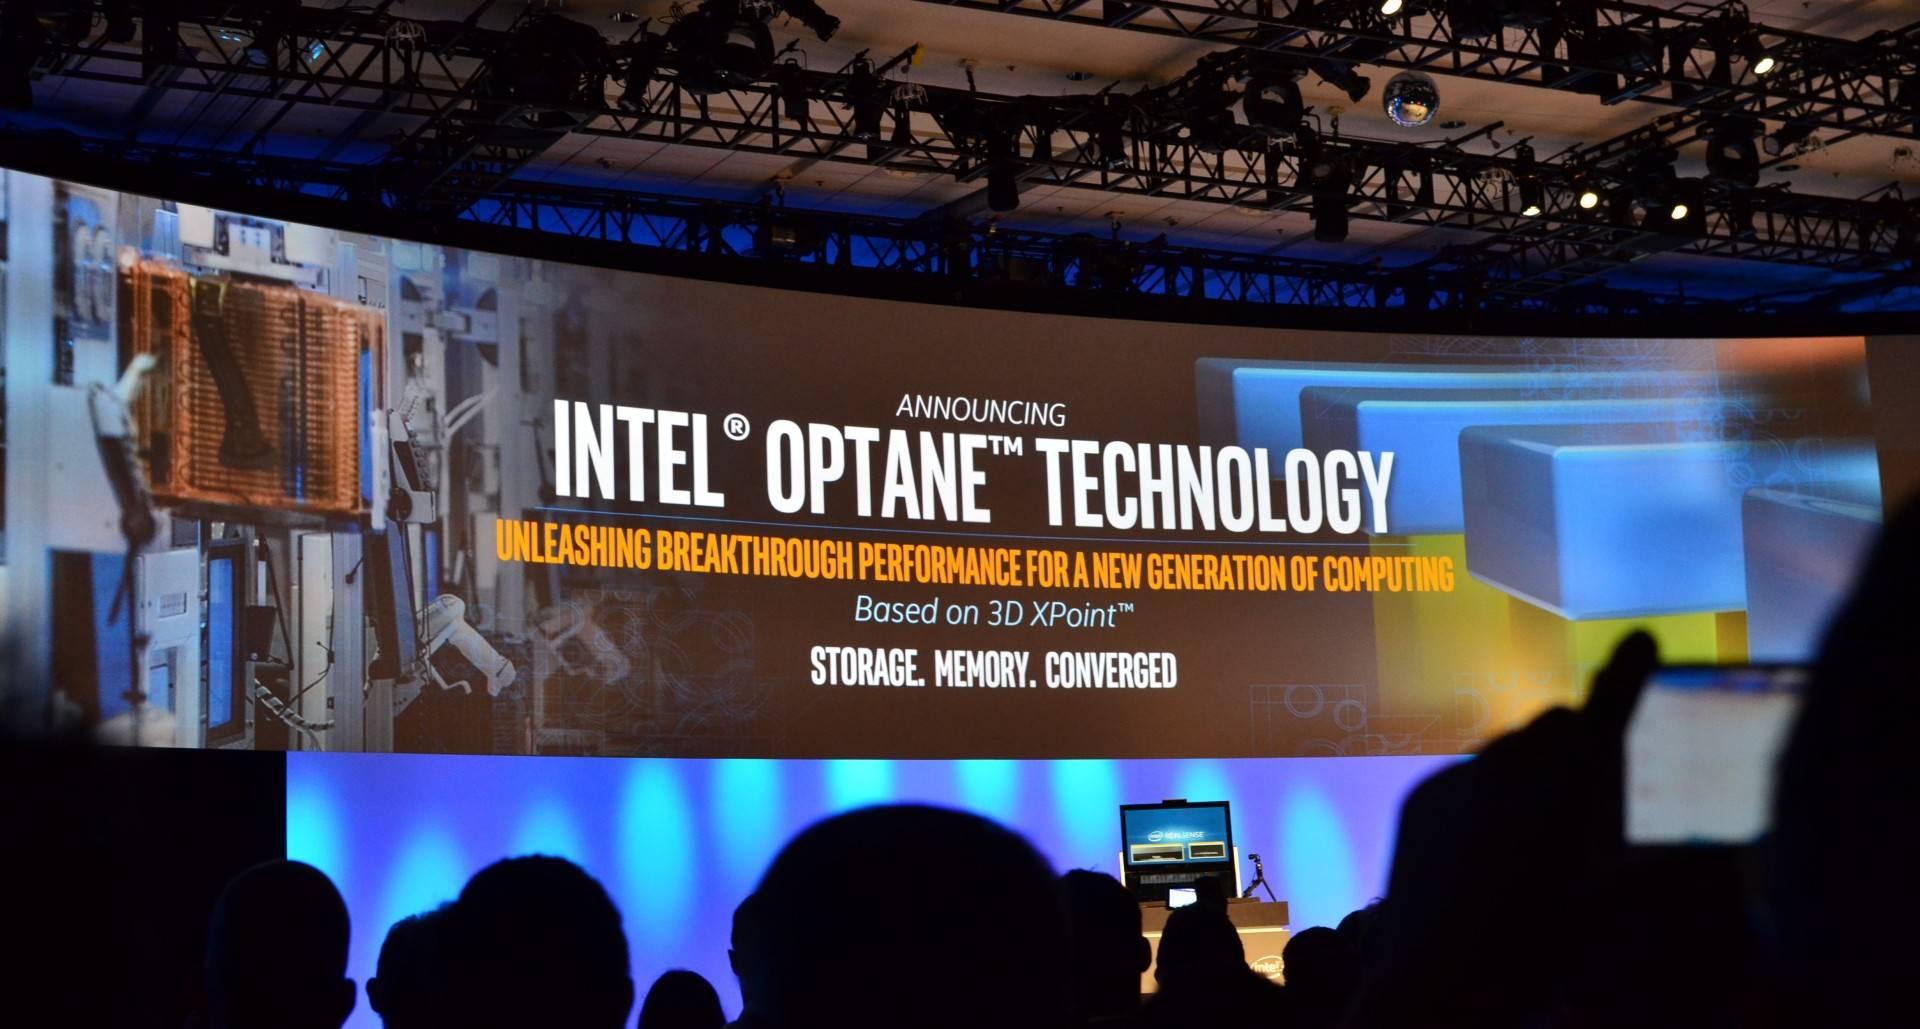 Intel-Optane-Technology-Feature-IDF15